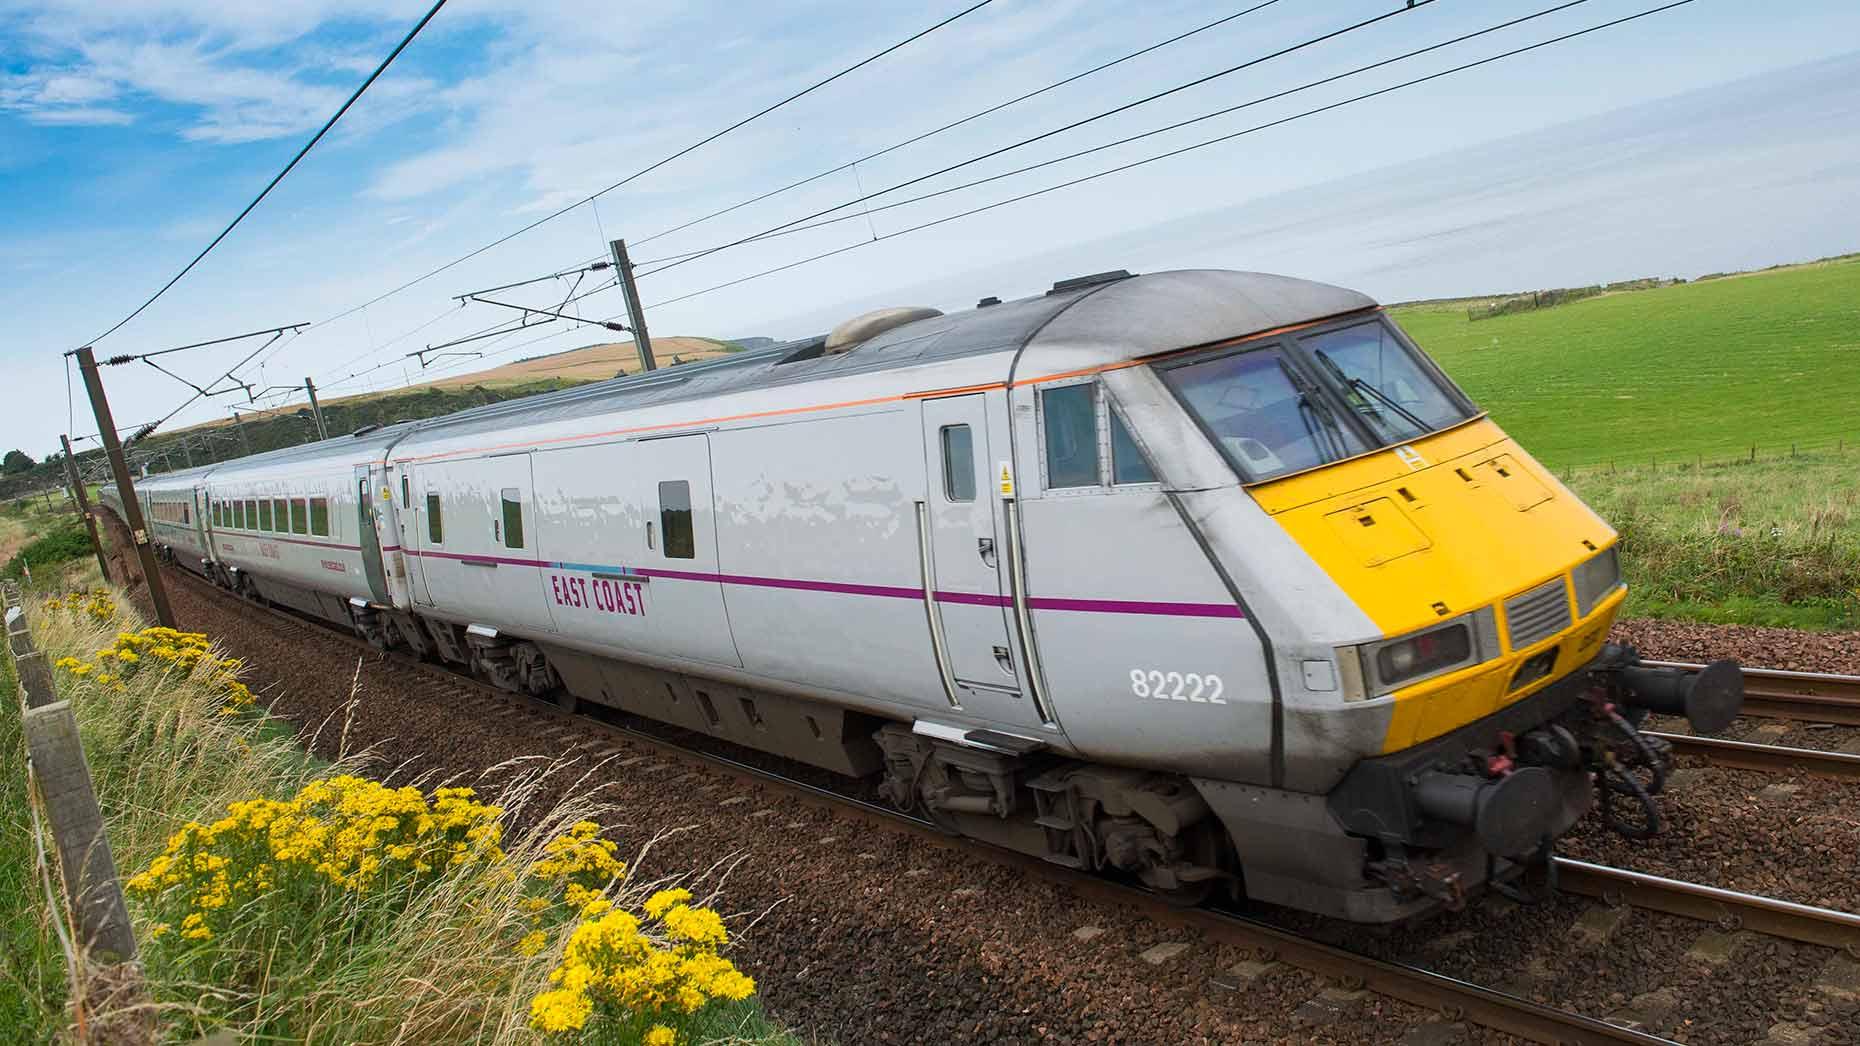 Find information on trains to East Midlands Parkway station including live departure boards, station information and cheap train tickets with Trainline.